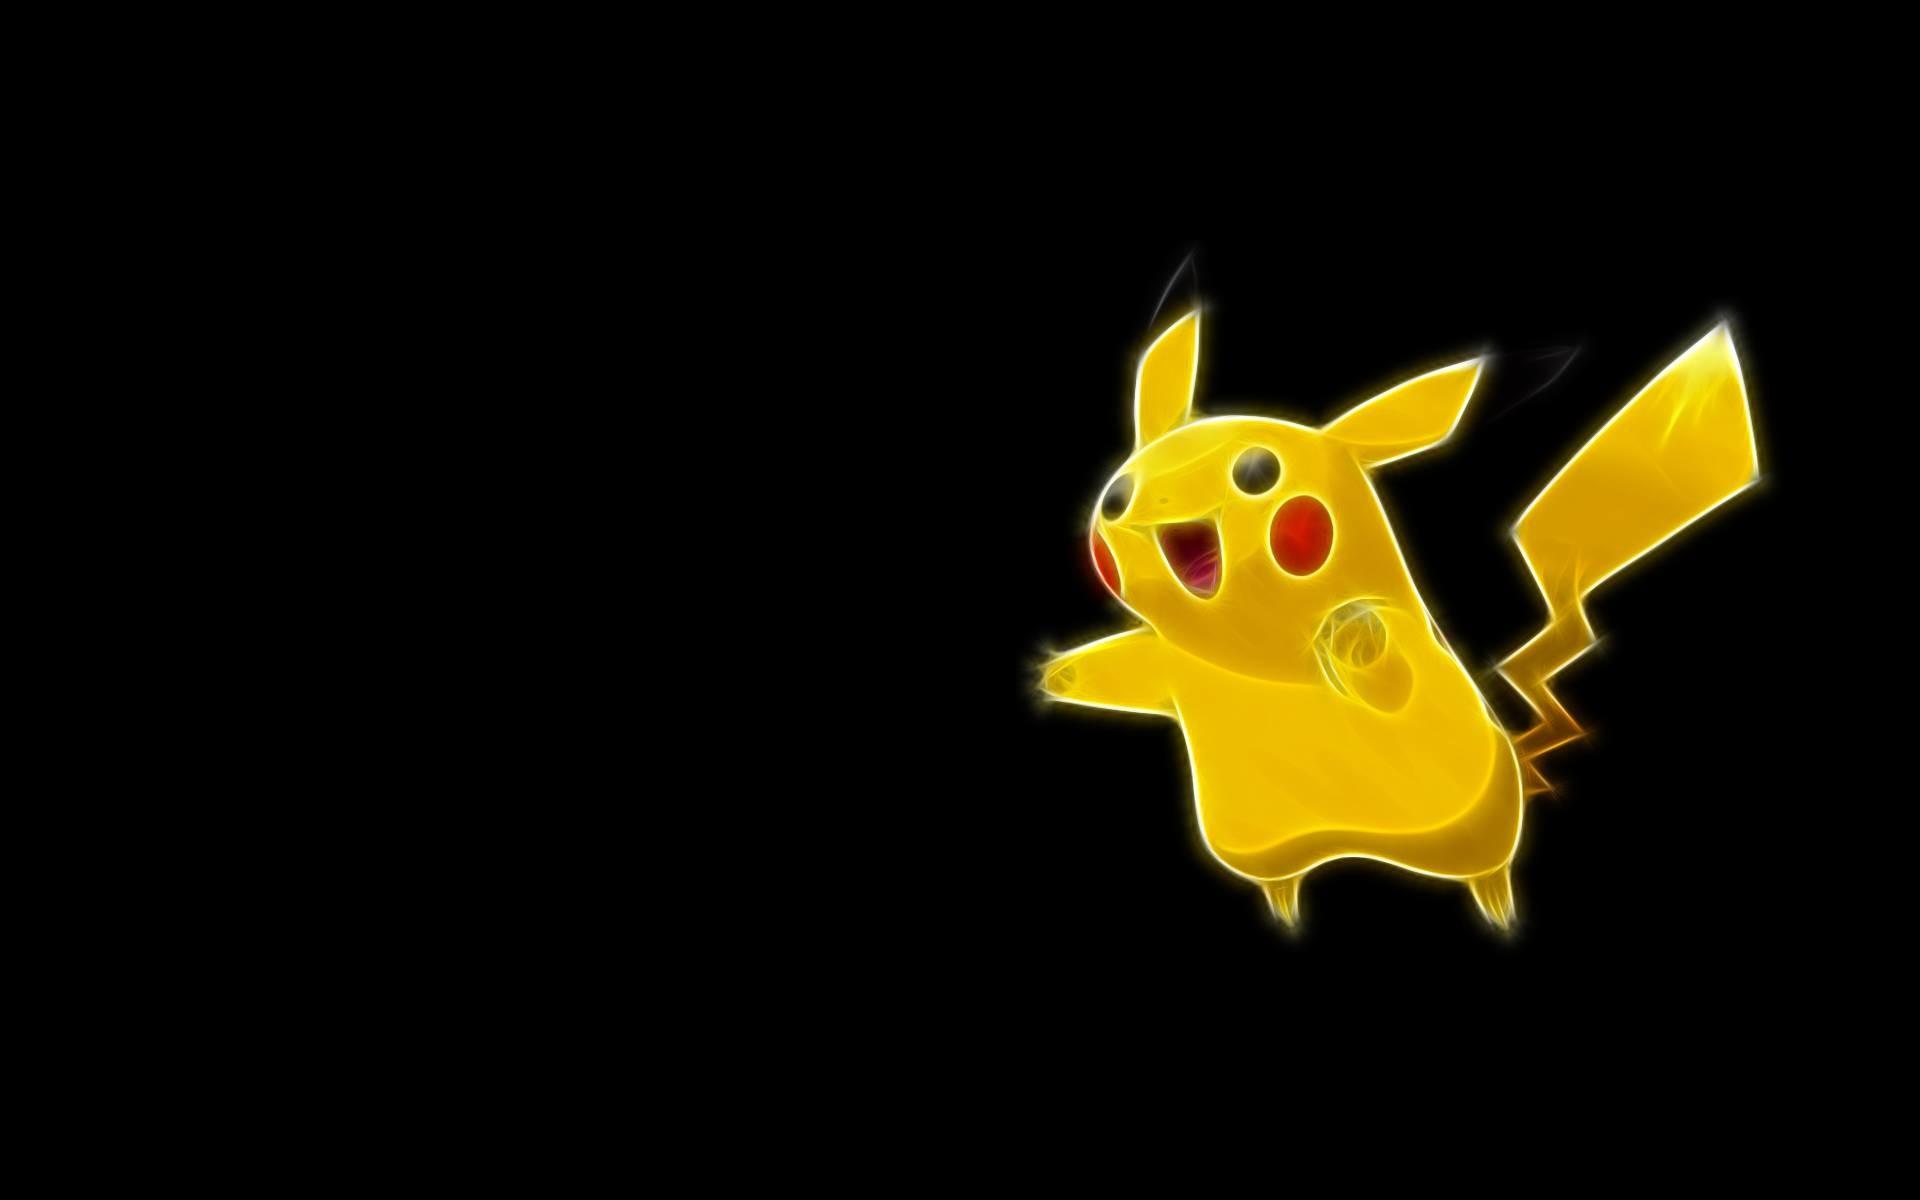 … download pikachu wallpaper 4352 px high resolution …